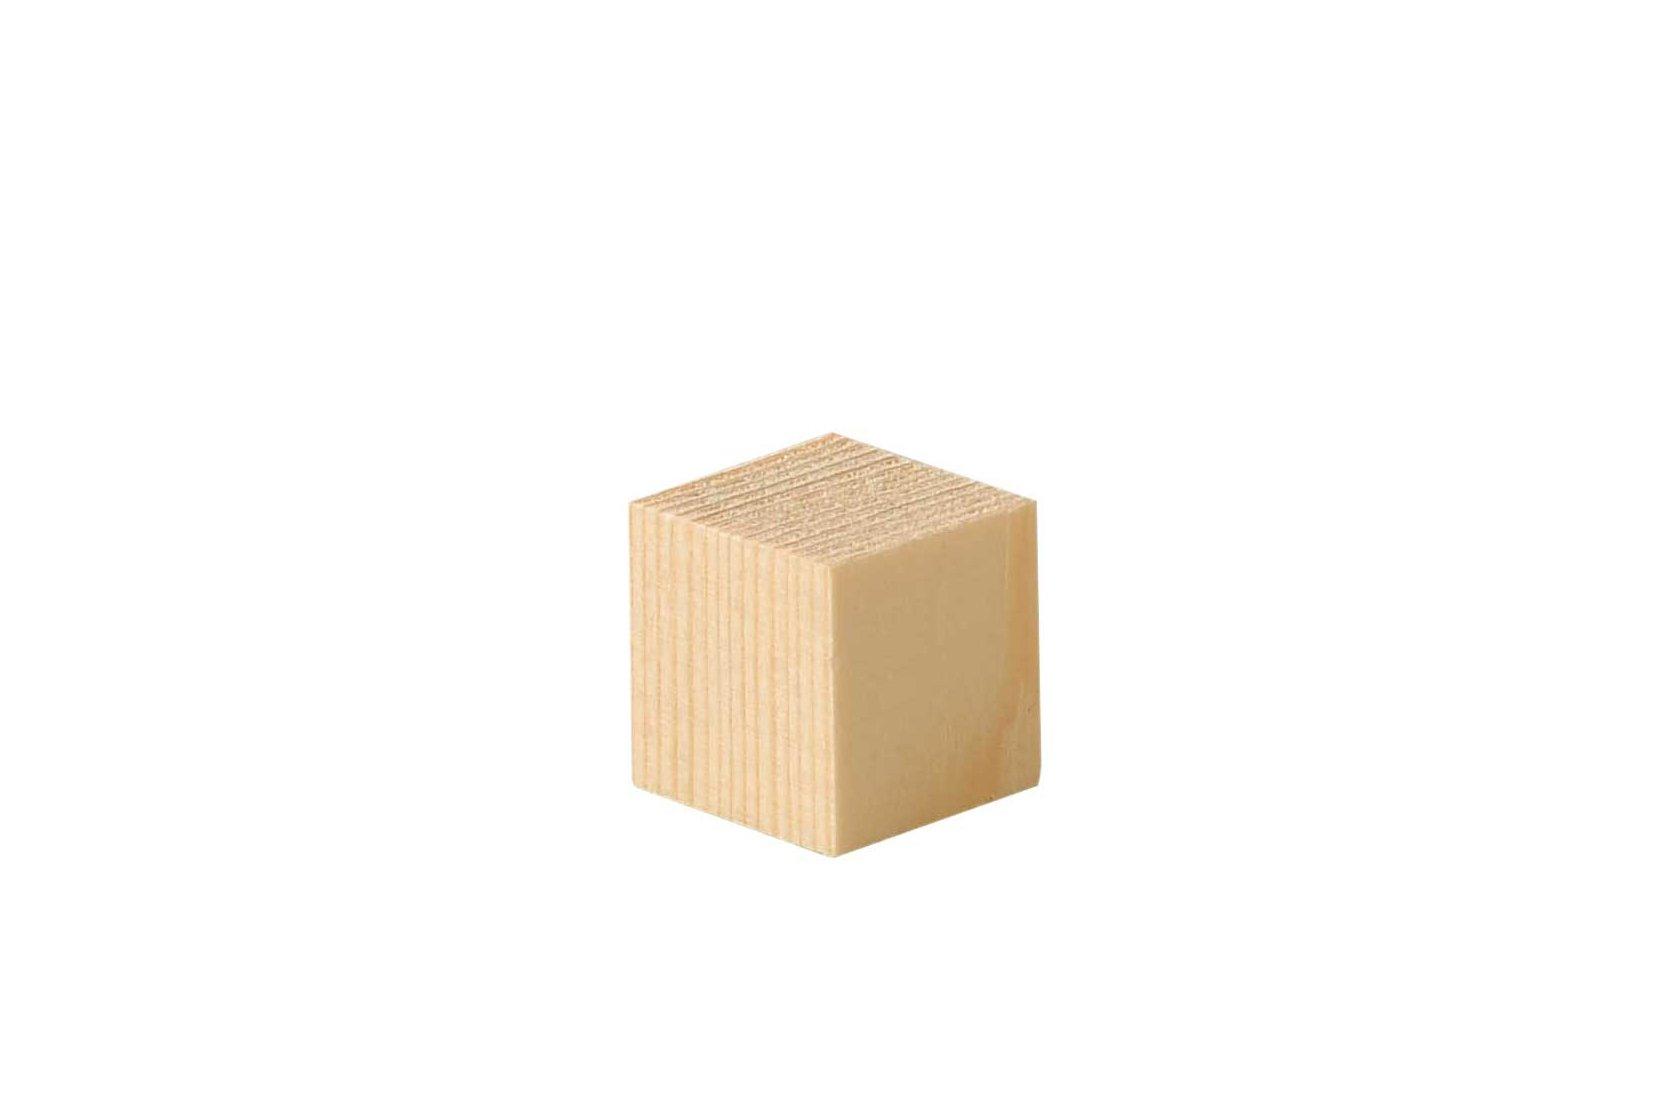 Holzwürfel Kiefer - 50er Pkg., 2x2x2 cm